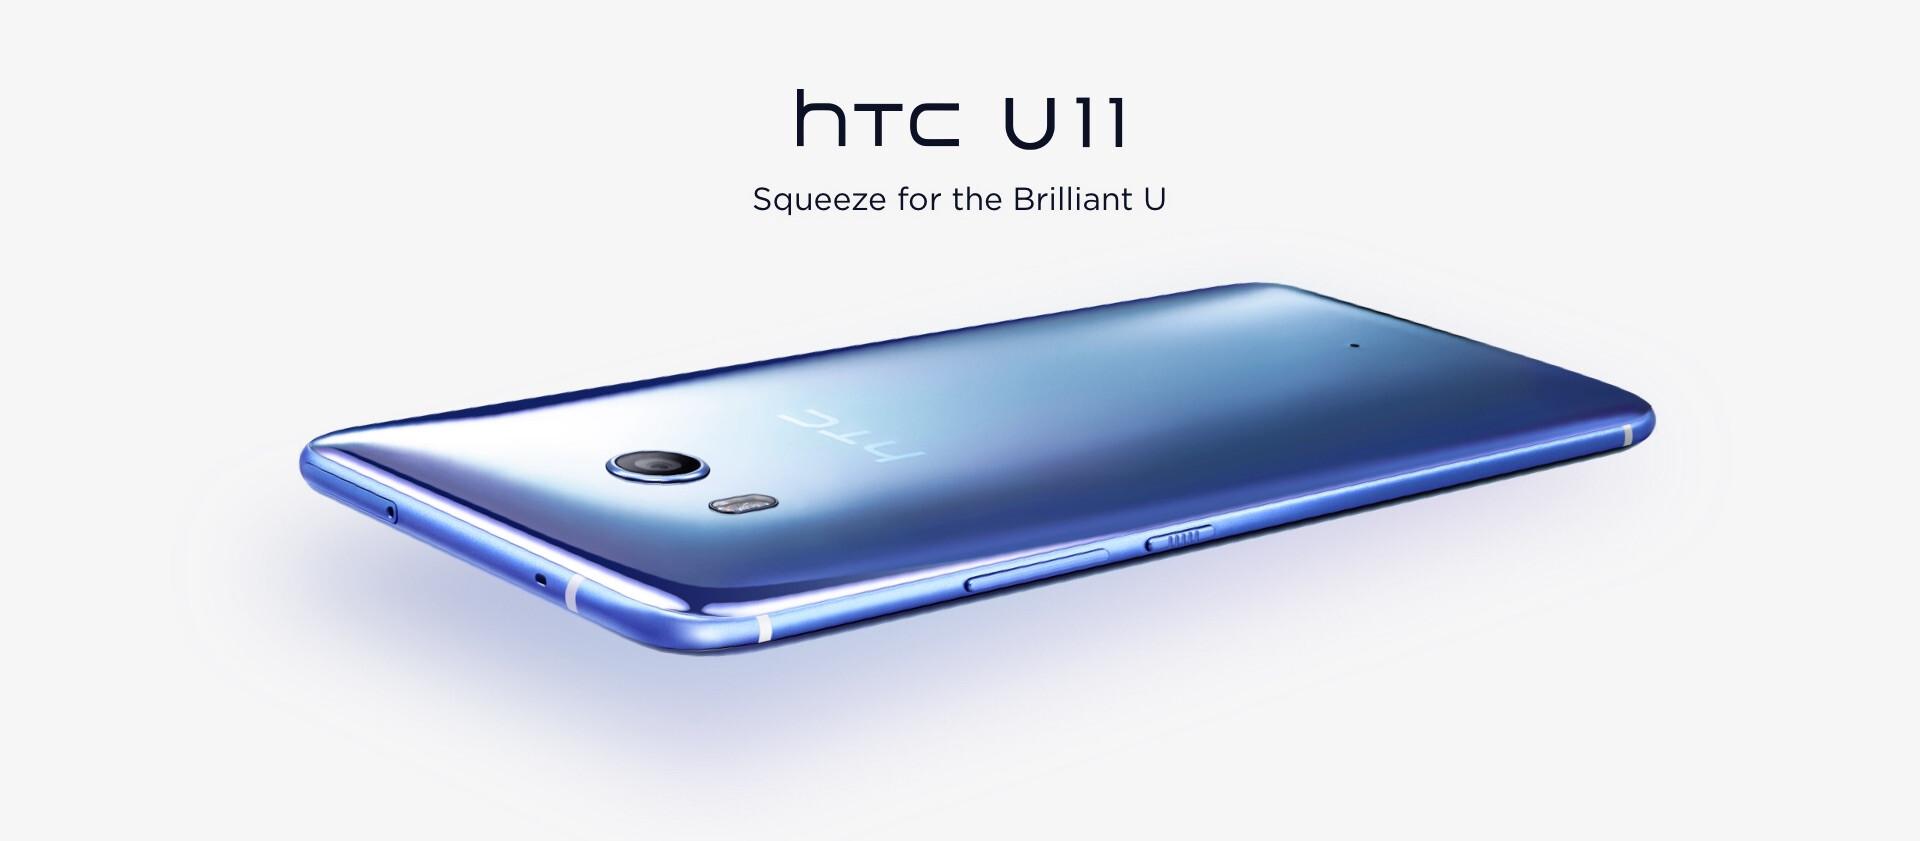 HTC U11 6GB RAM variant